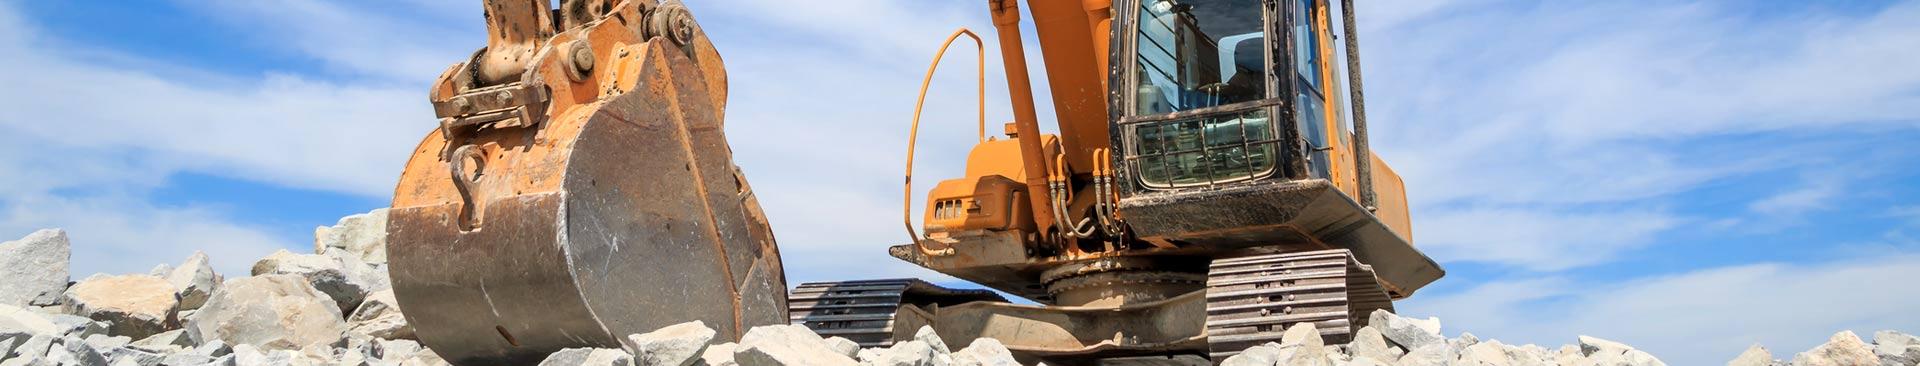 Demolition Australia Excavator